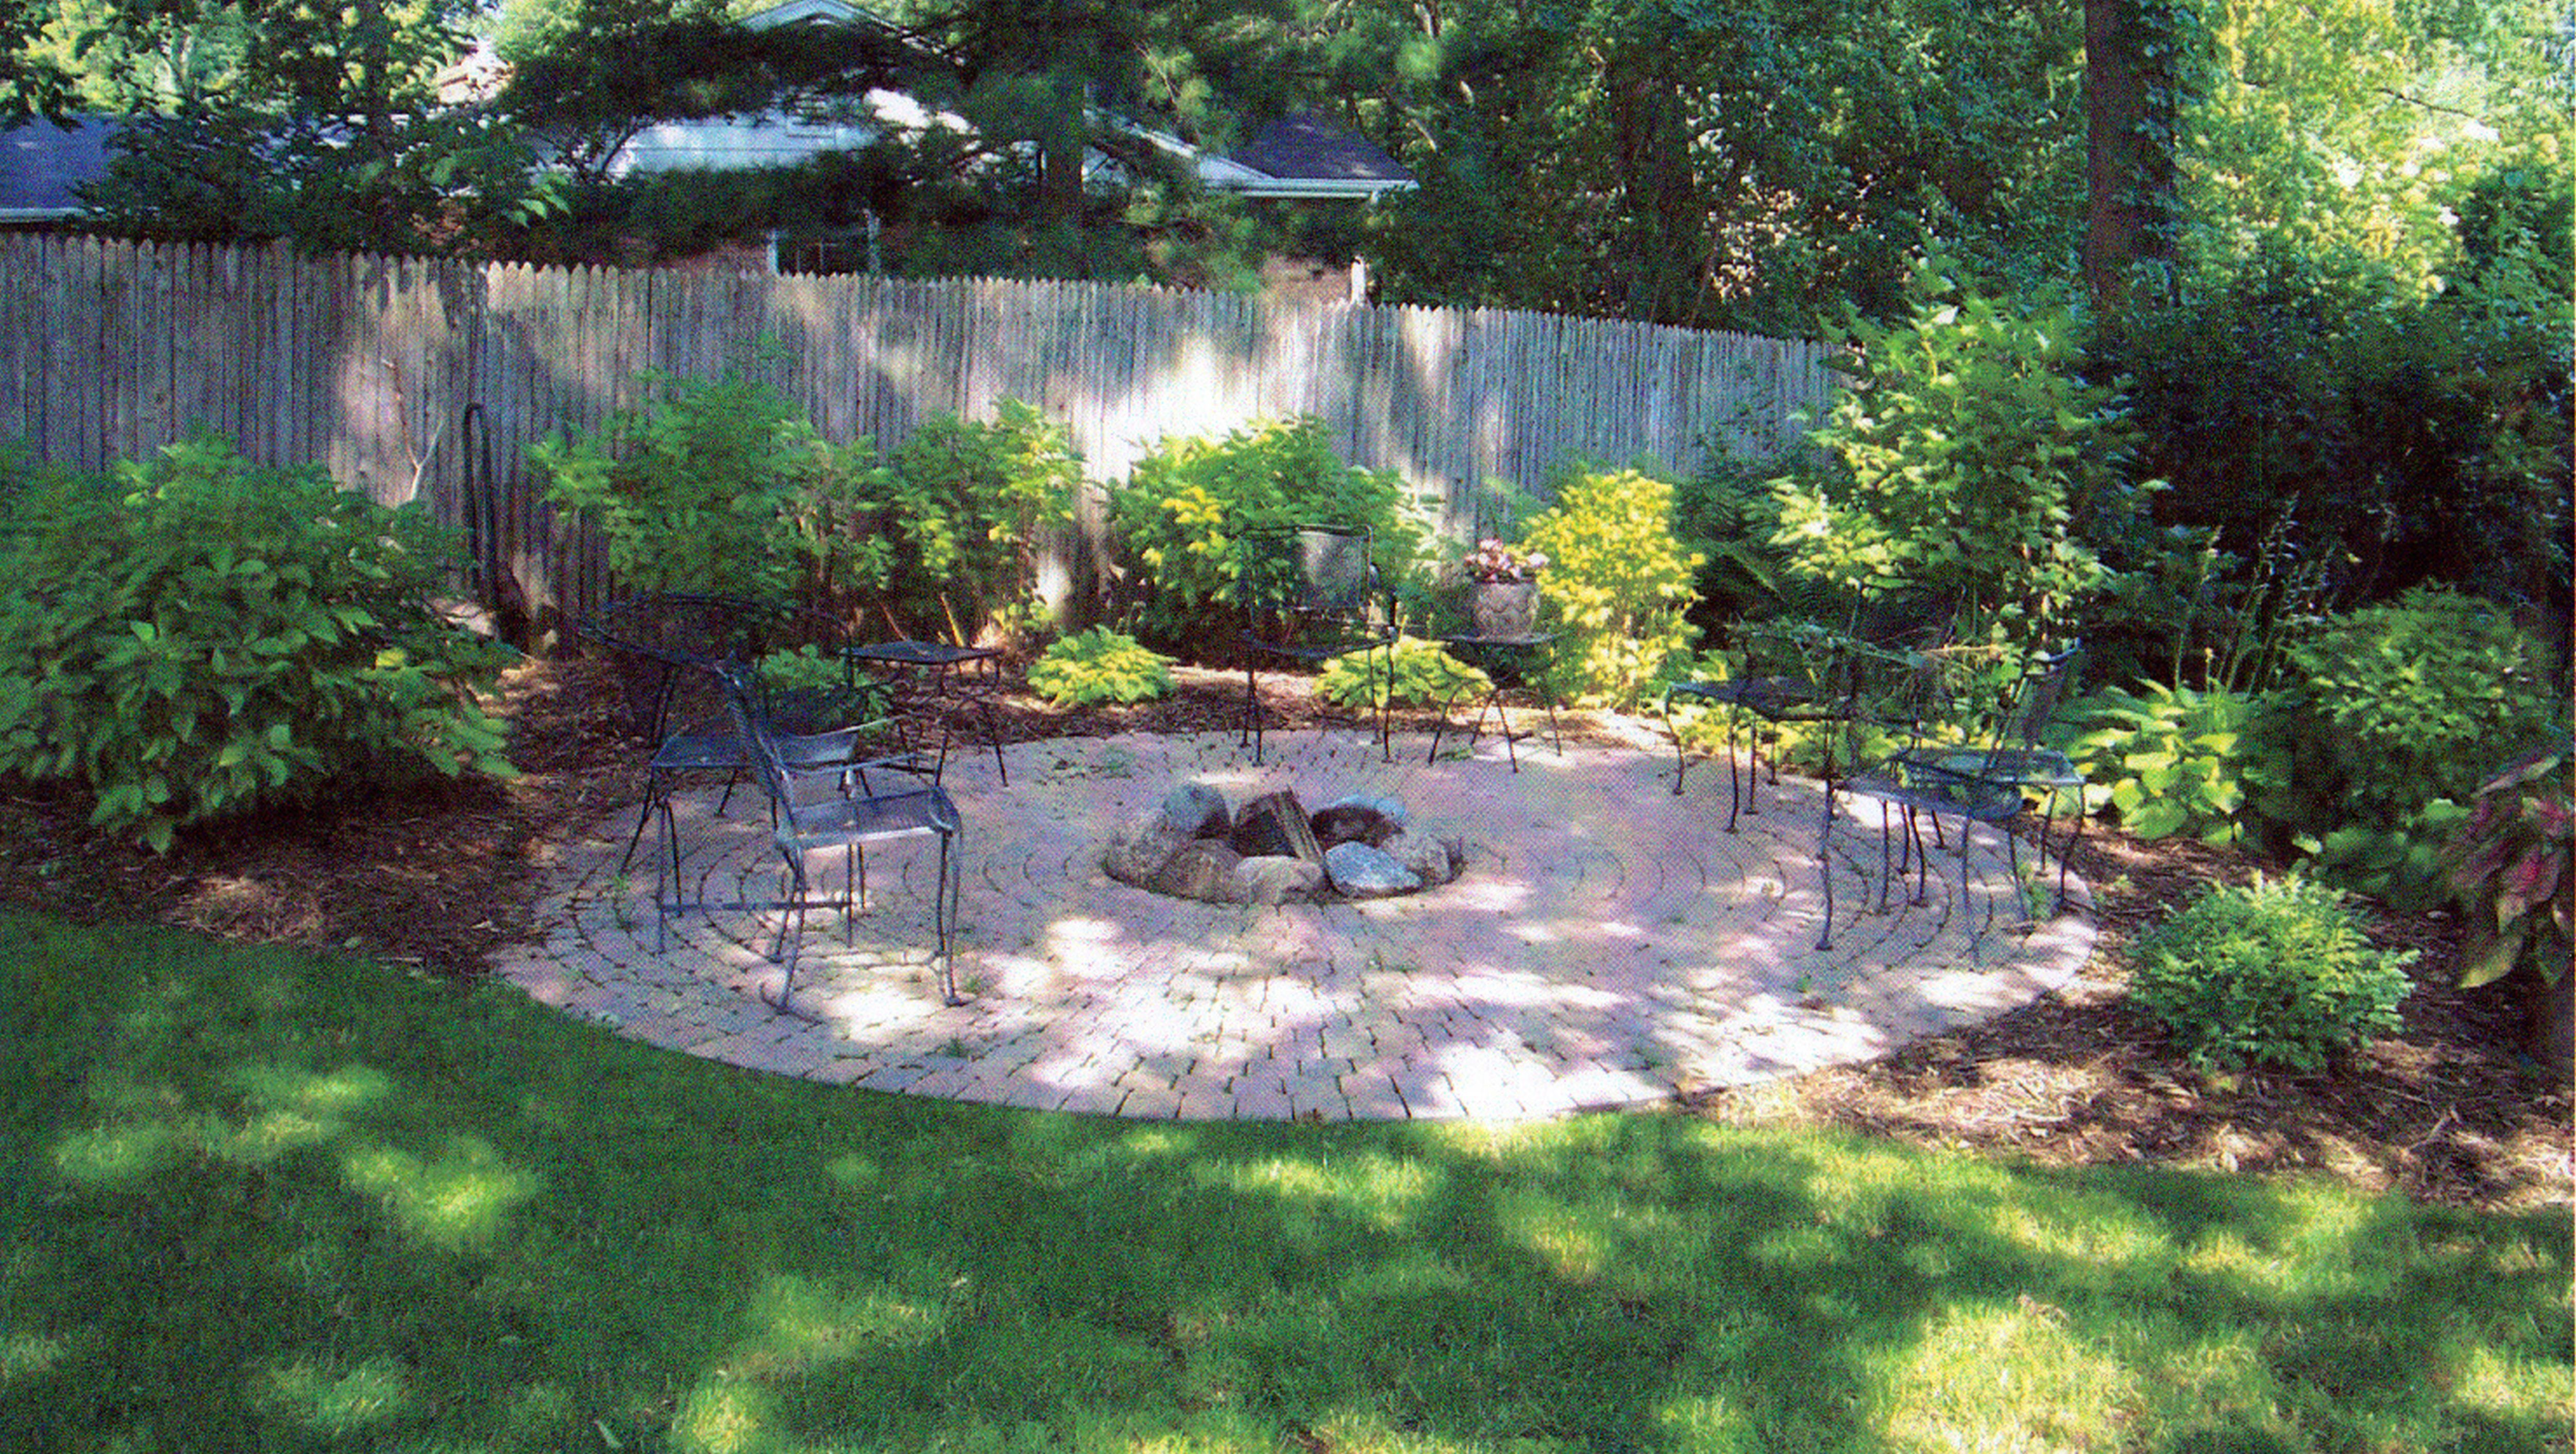 Diy Landscape Design For Beginners Elly S Diy Blog Large Backyard Landscaping Small Yard Design Small Yard Landscaping